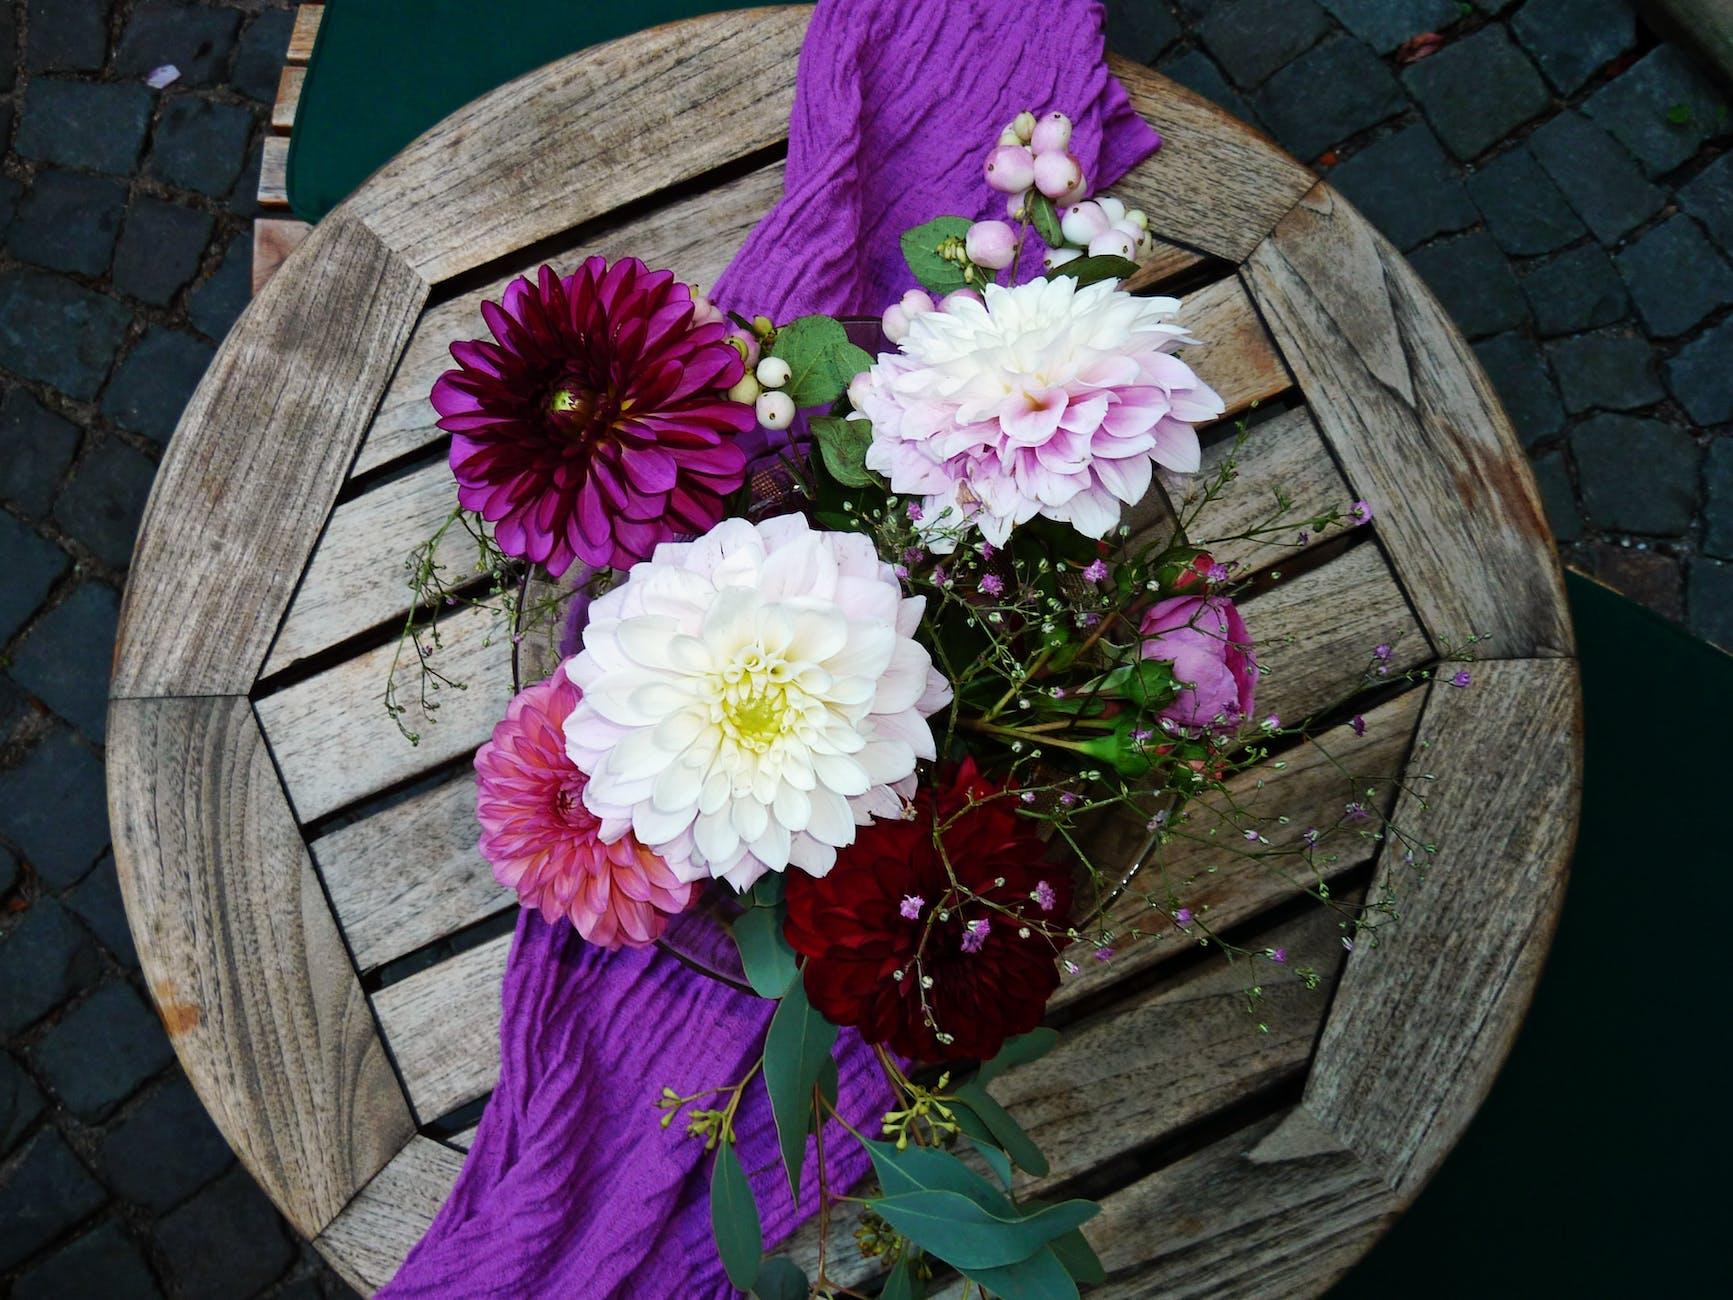 Fall Bloomers|7 Garden Flower Ultimate Ideas for Every Season